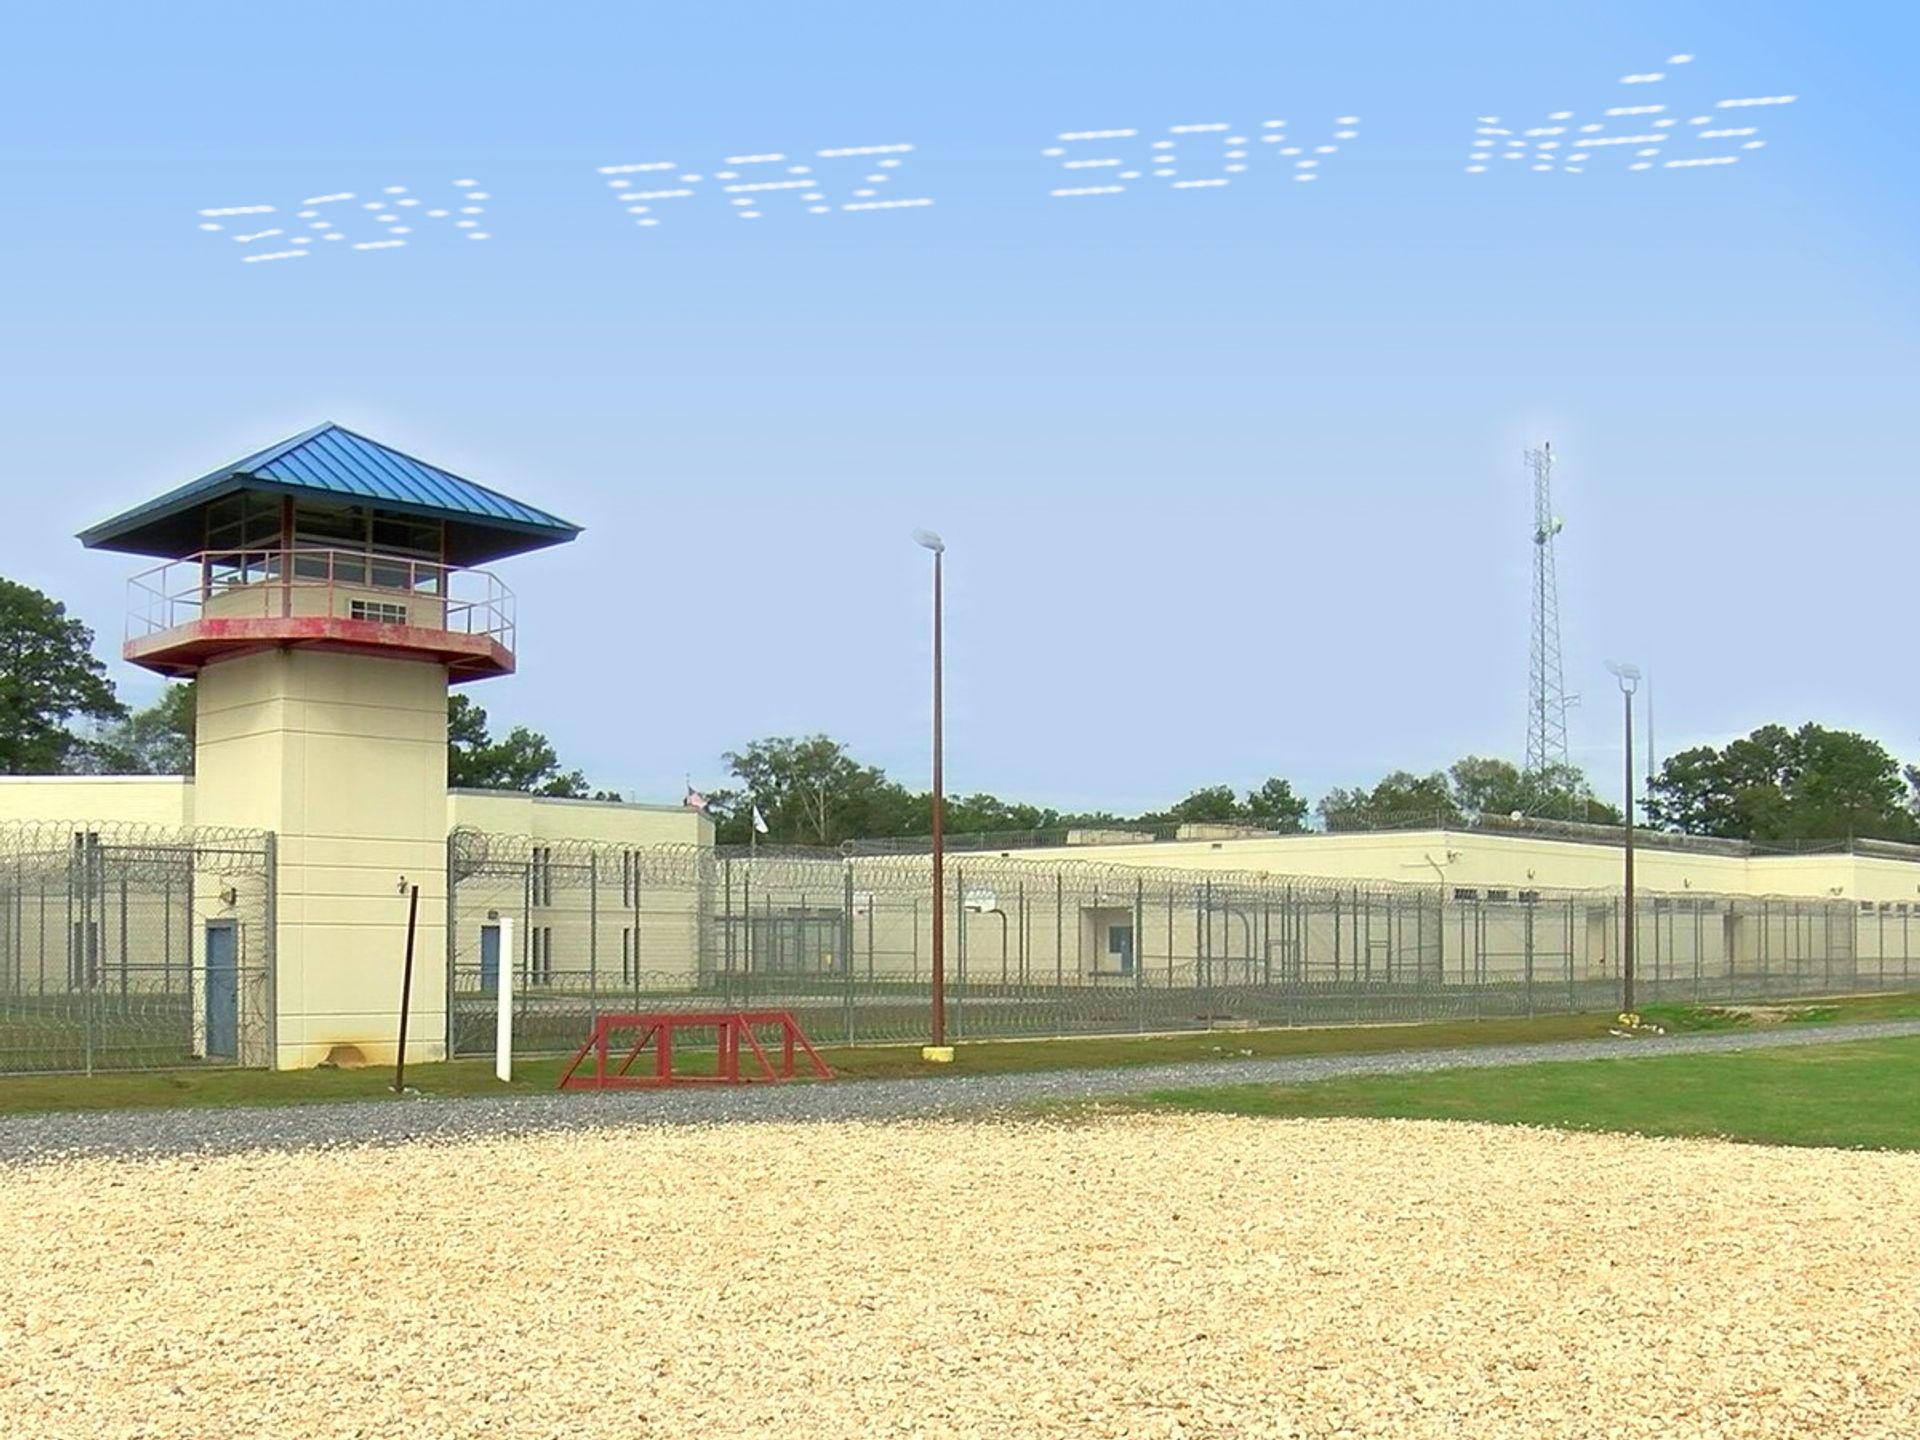 Maria Gaspar, Soy Paz Soy Mas at the Coastal Bend Detention Center in Texas. Captured via 4th Wall, a free public AR app.